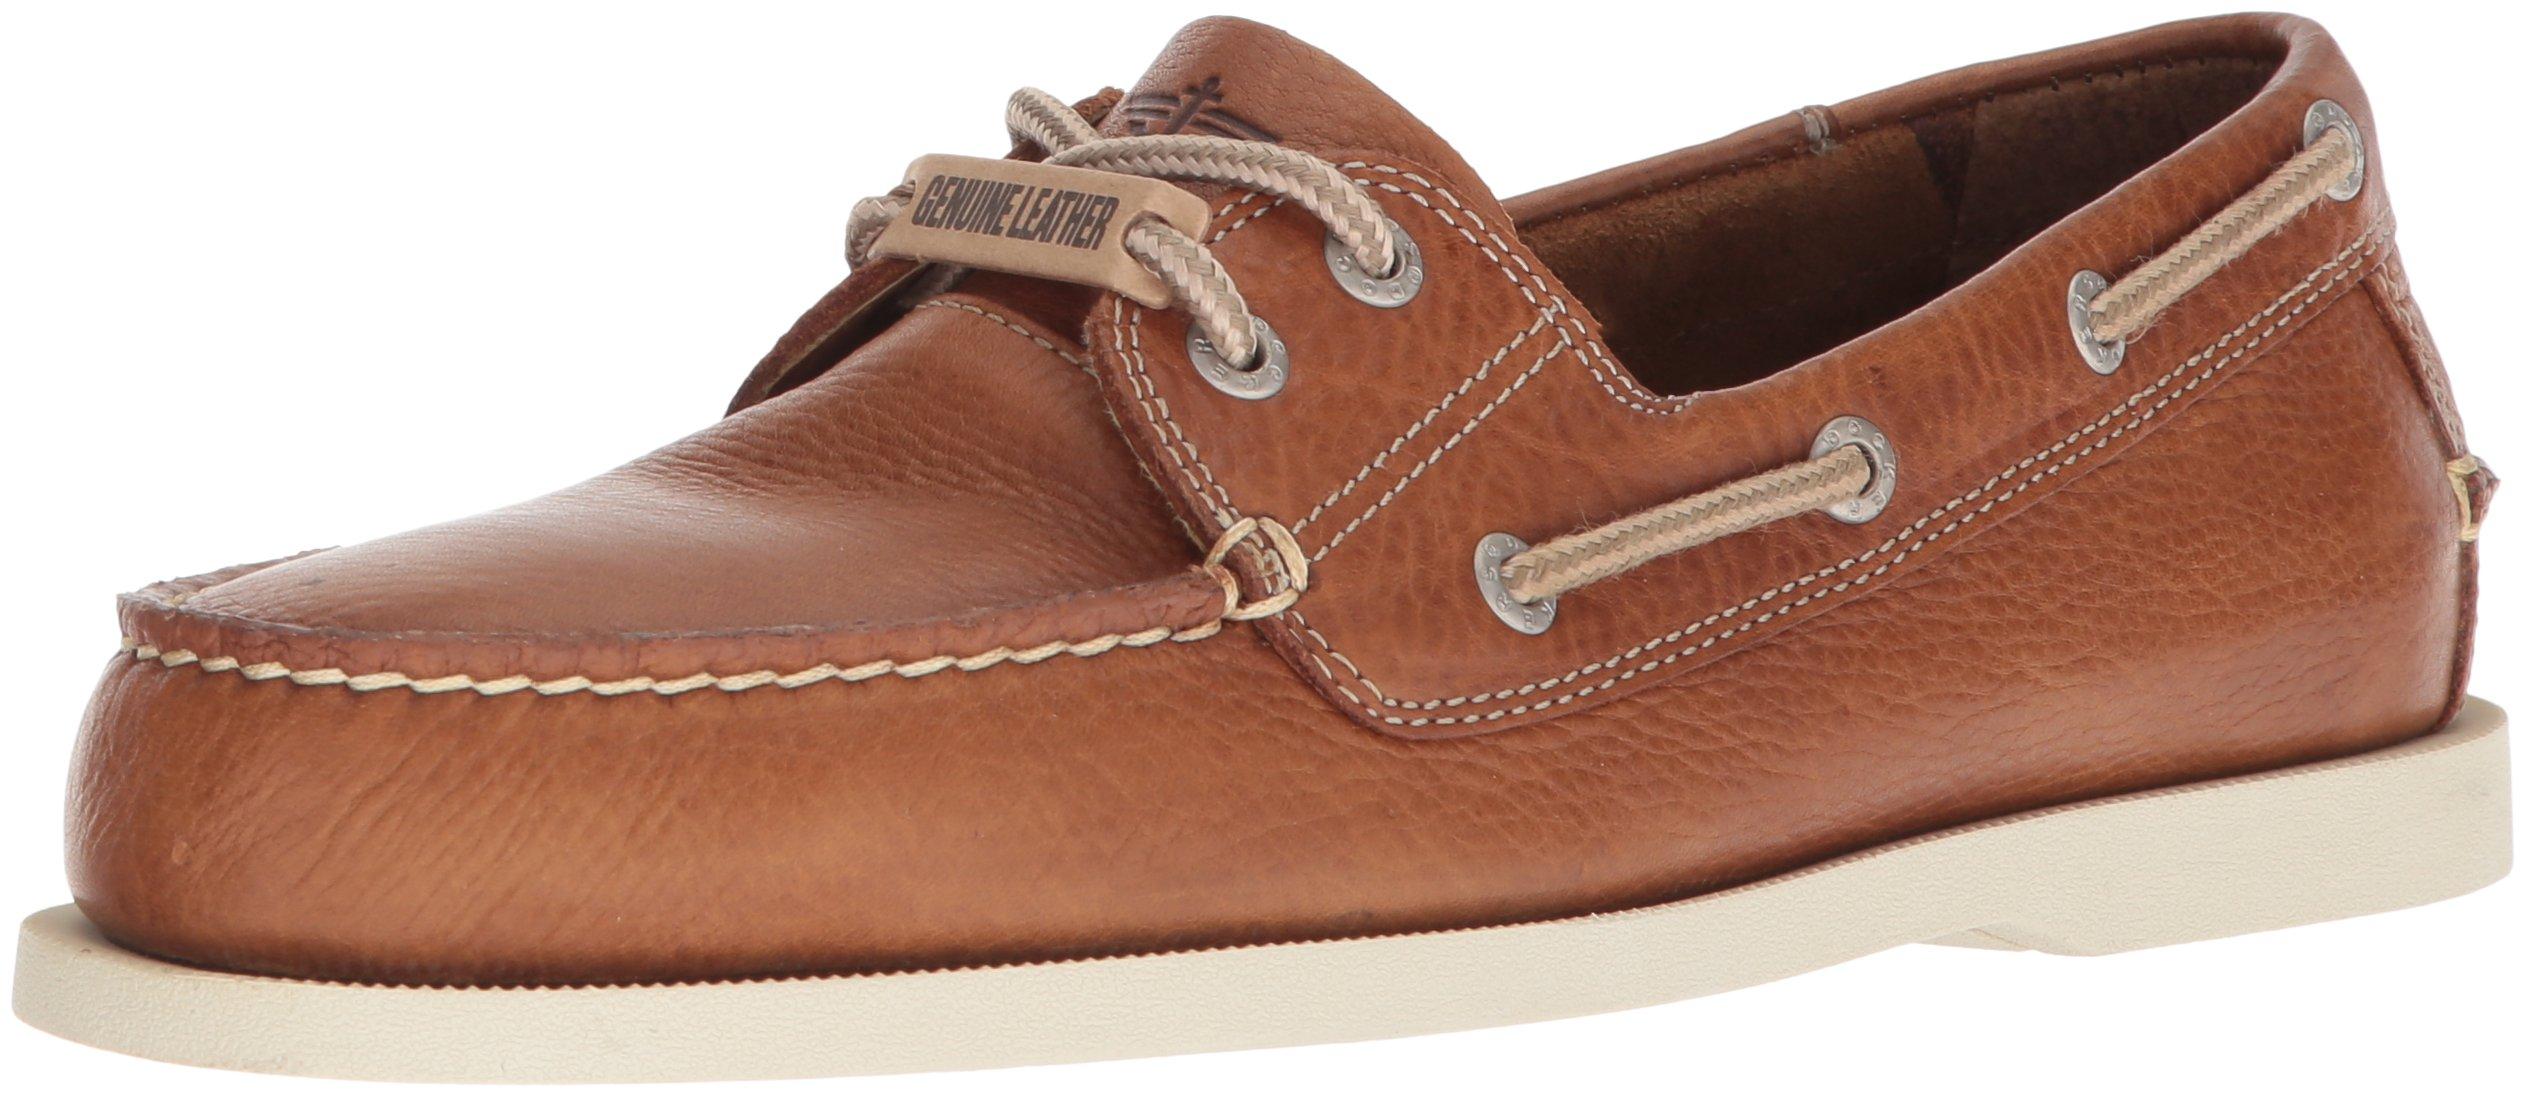 3c72b38253 Galleon - Dockers Mens Vargas Leather Casual Classic Boat Shoe, Dark Tan, 7  M